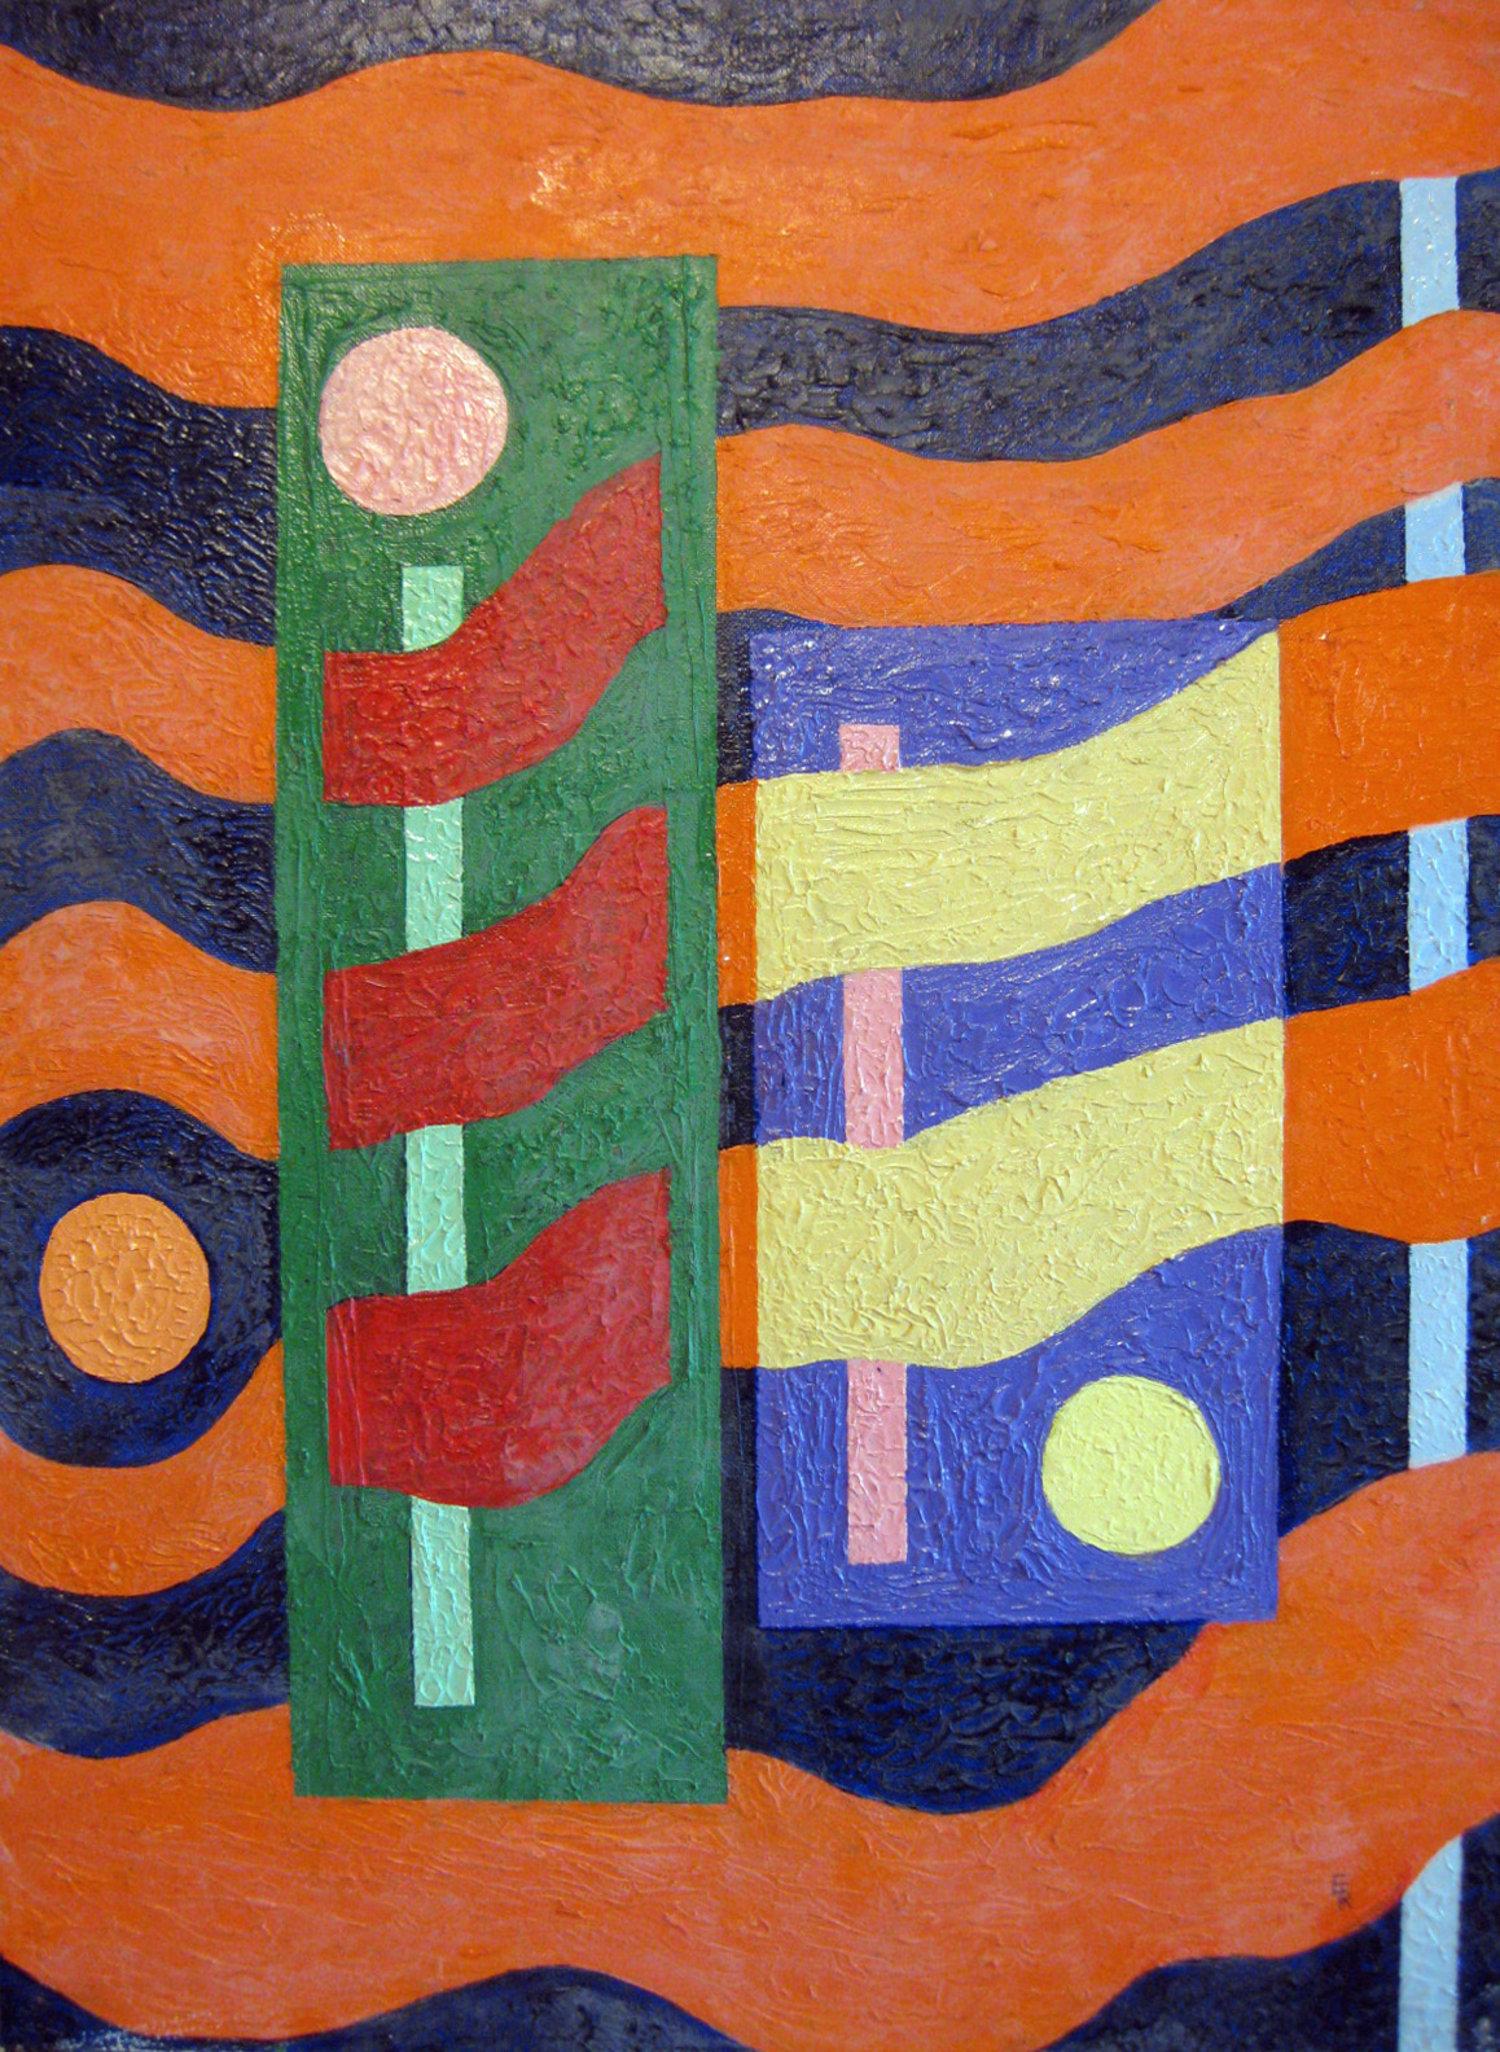 Kloubec, Edward F.- New Art- Sunscape